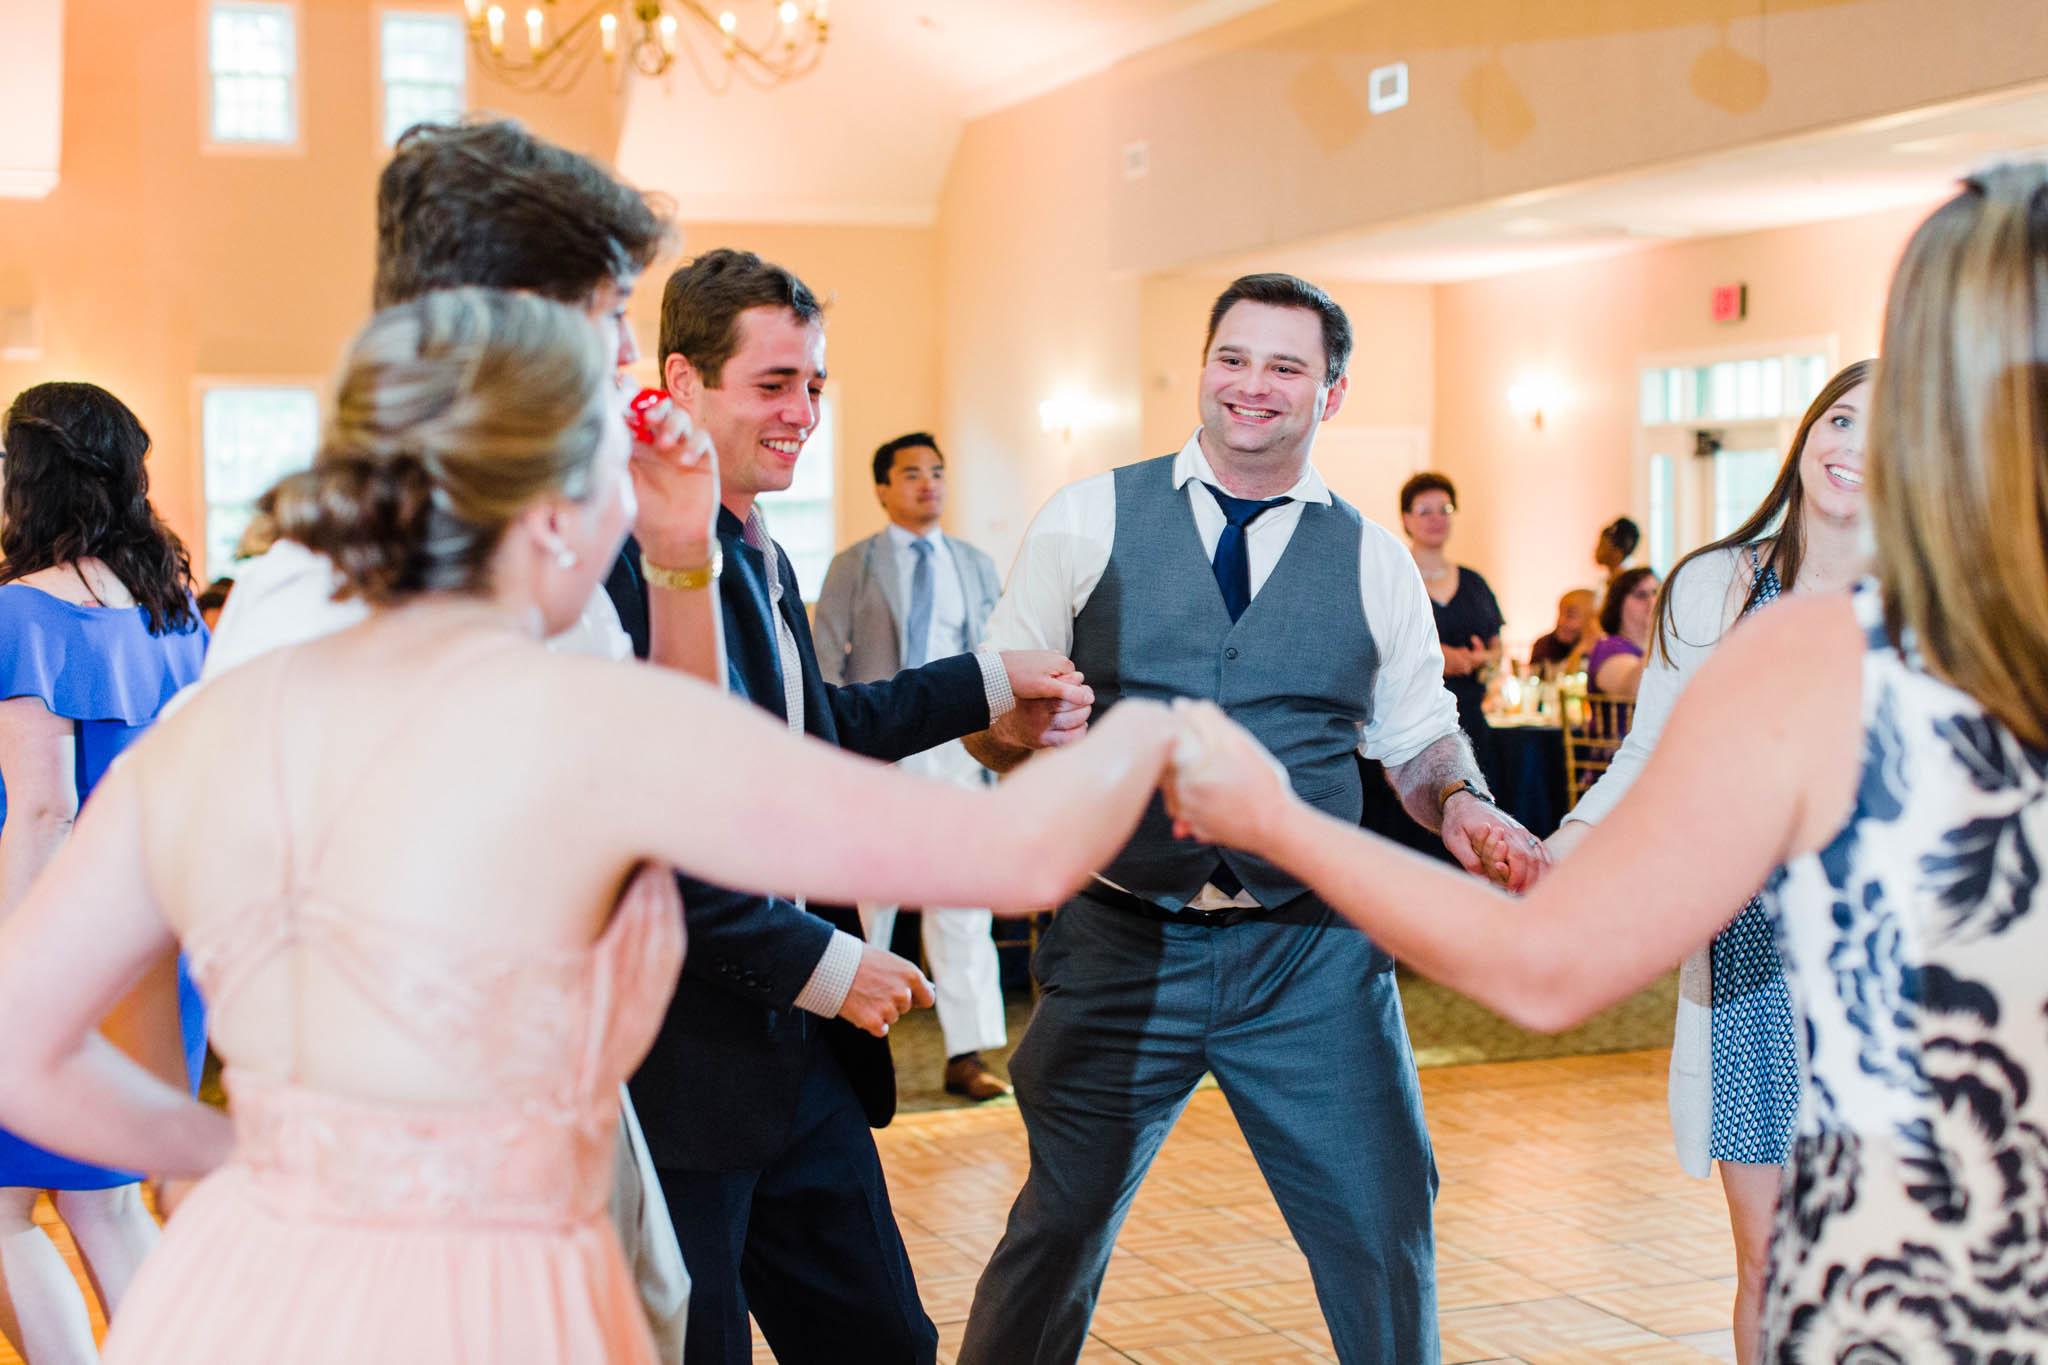 lynchburg-virginia-wedding-photographer-171.jpg